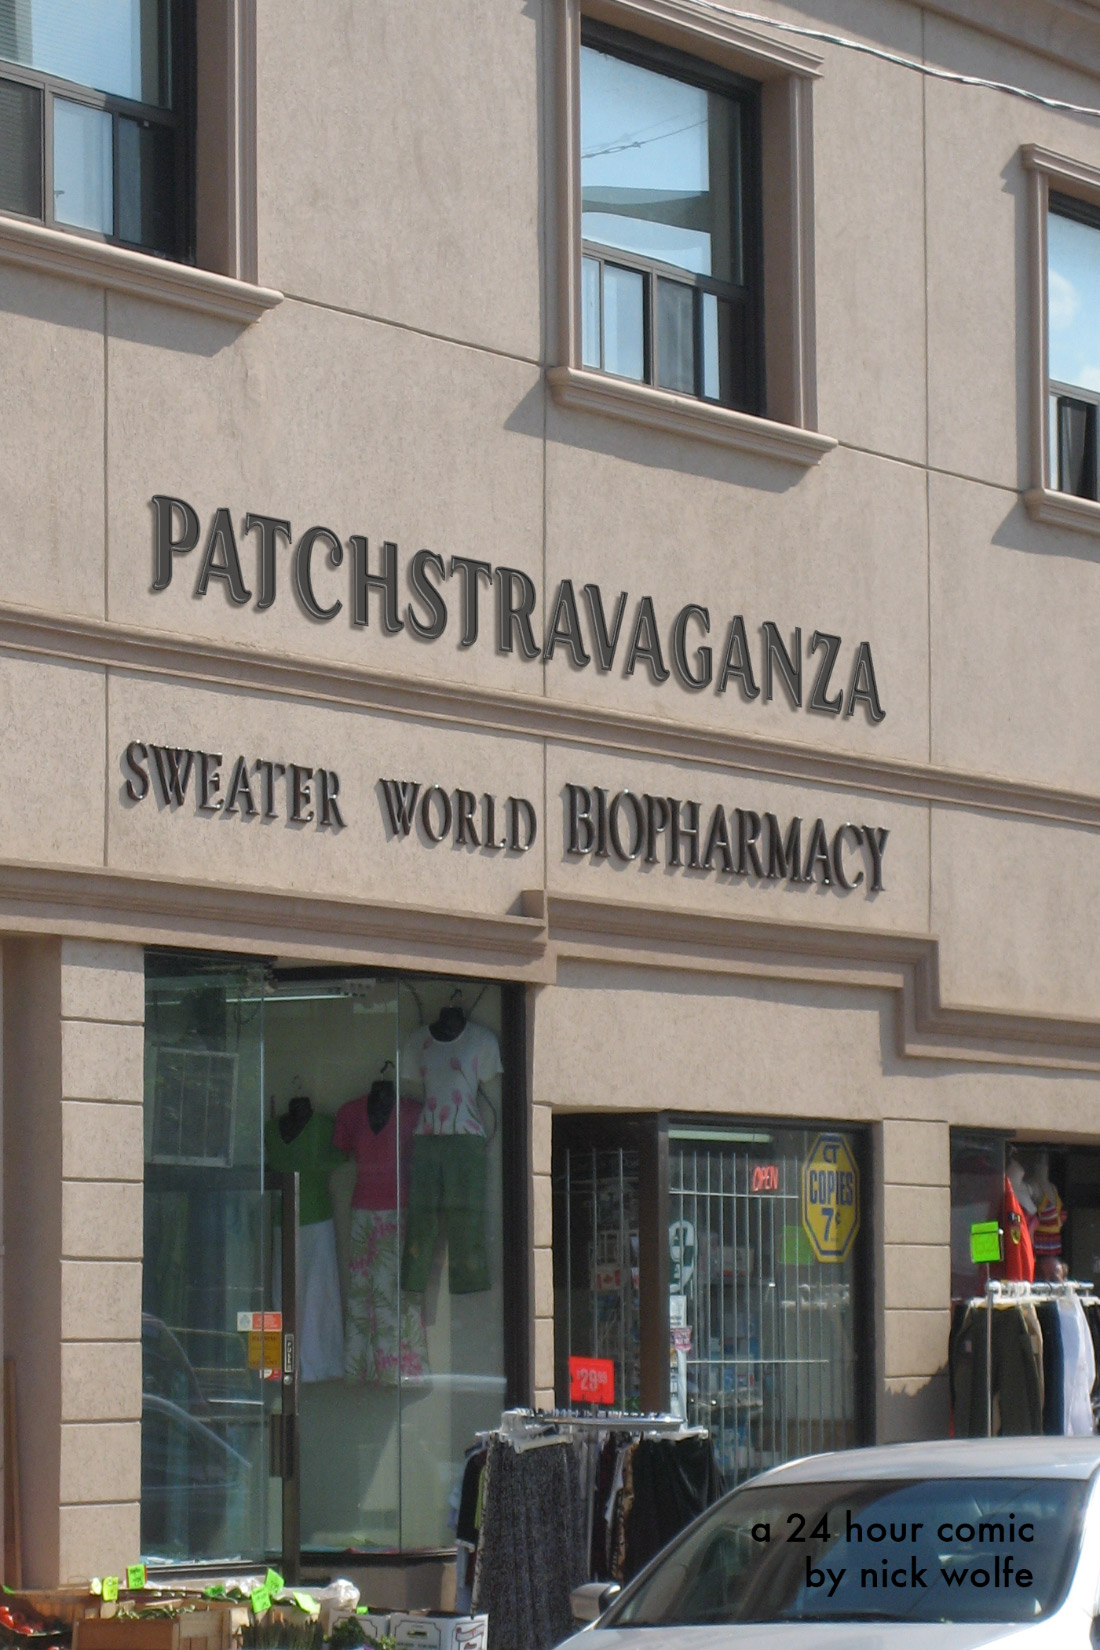 Patchstravaganza